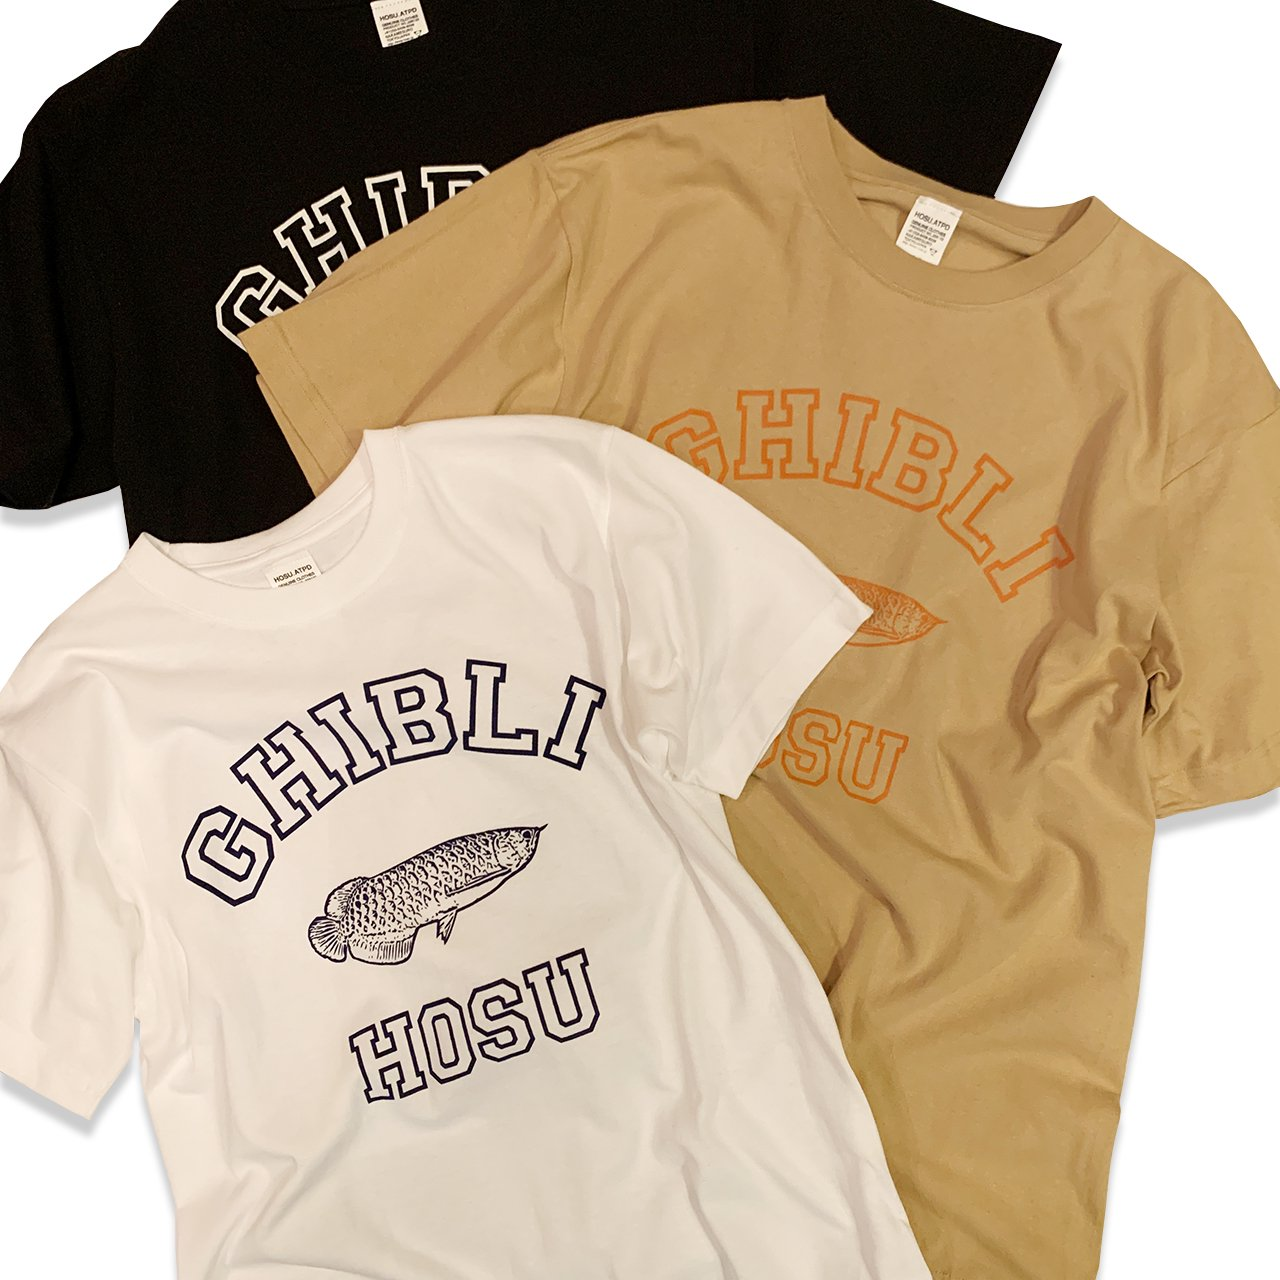 HOSU×GHIBLI アロワナプリントTシャツ/ホワイト、ブラック、ベージュ